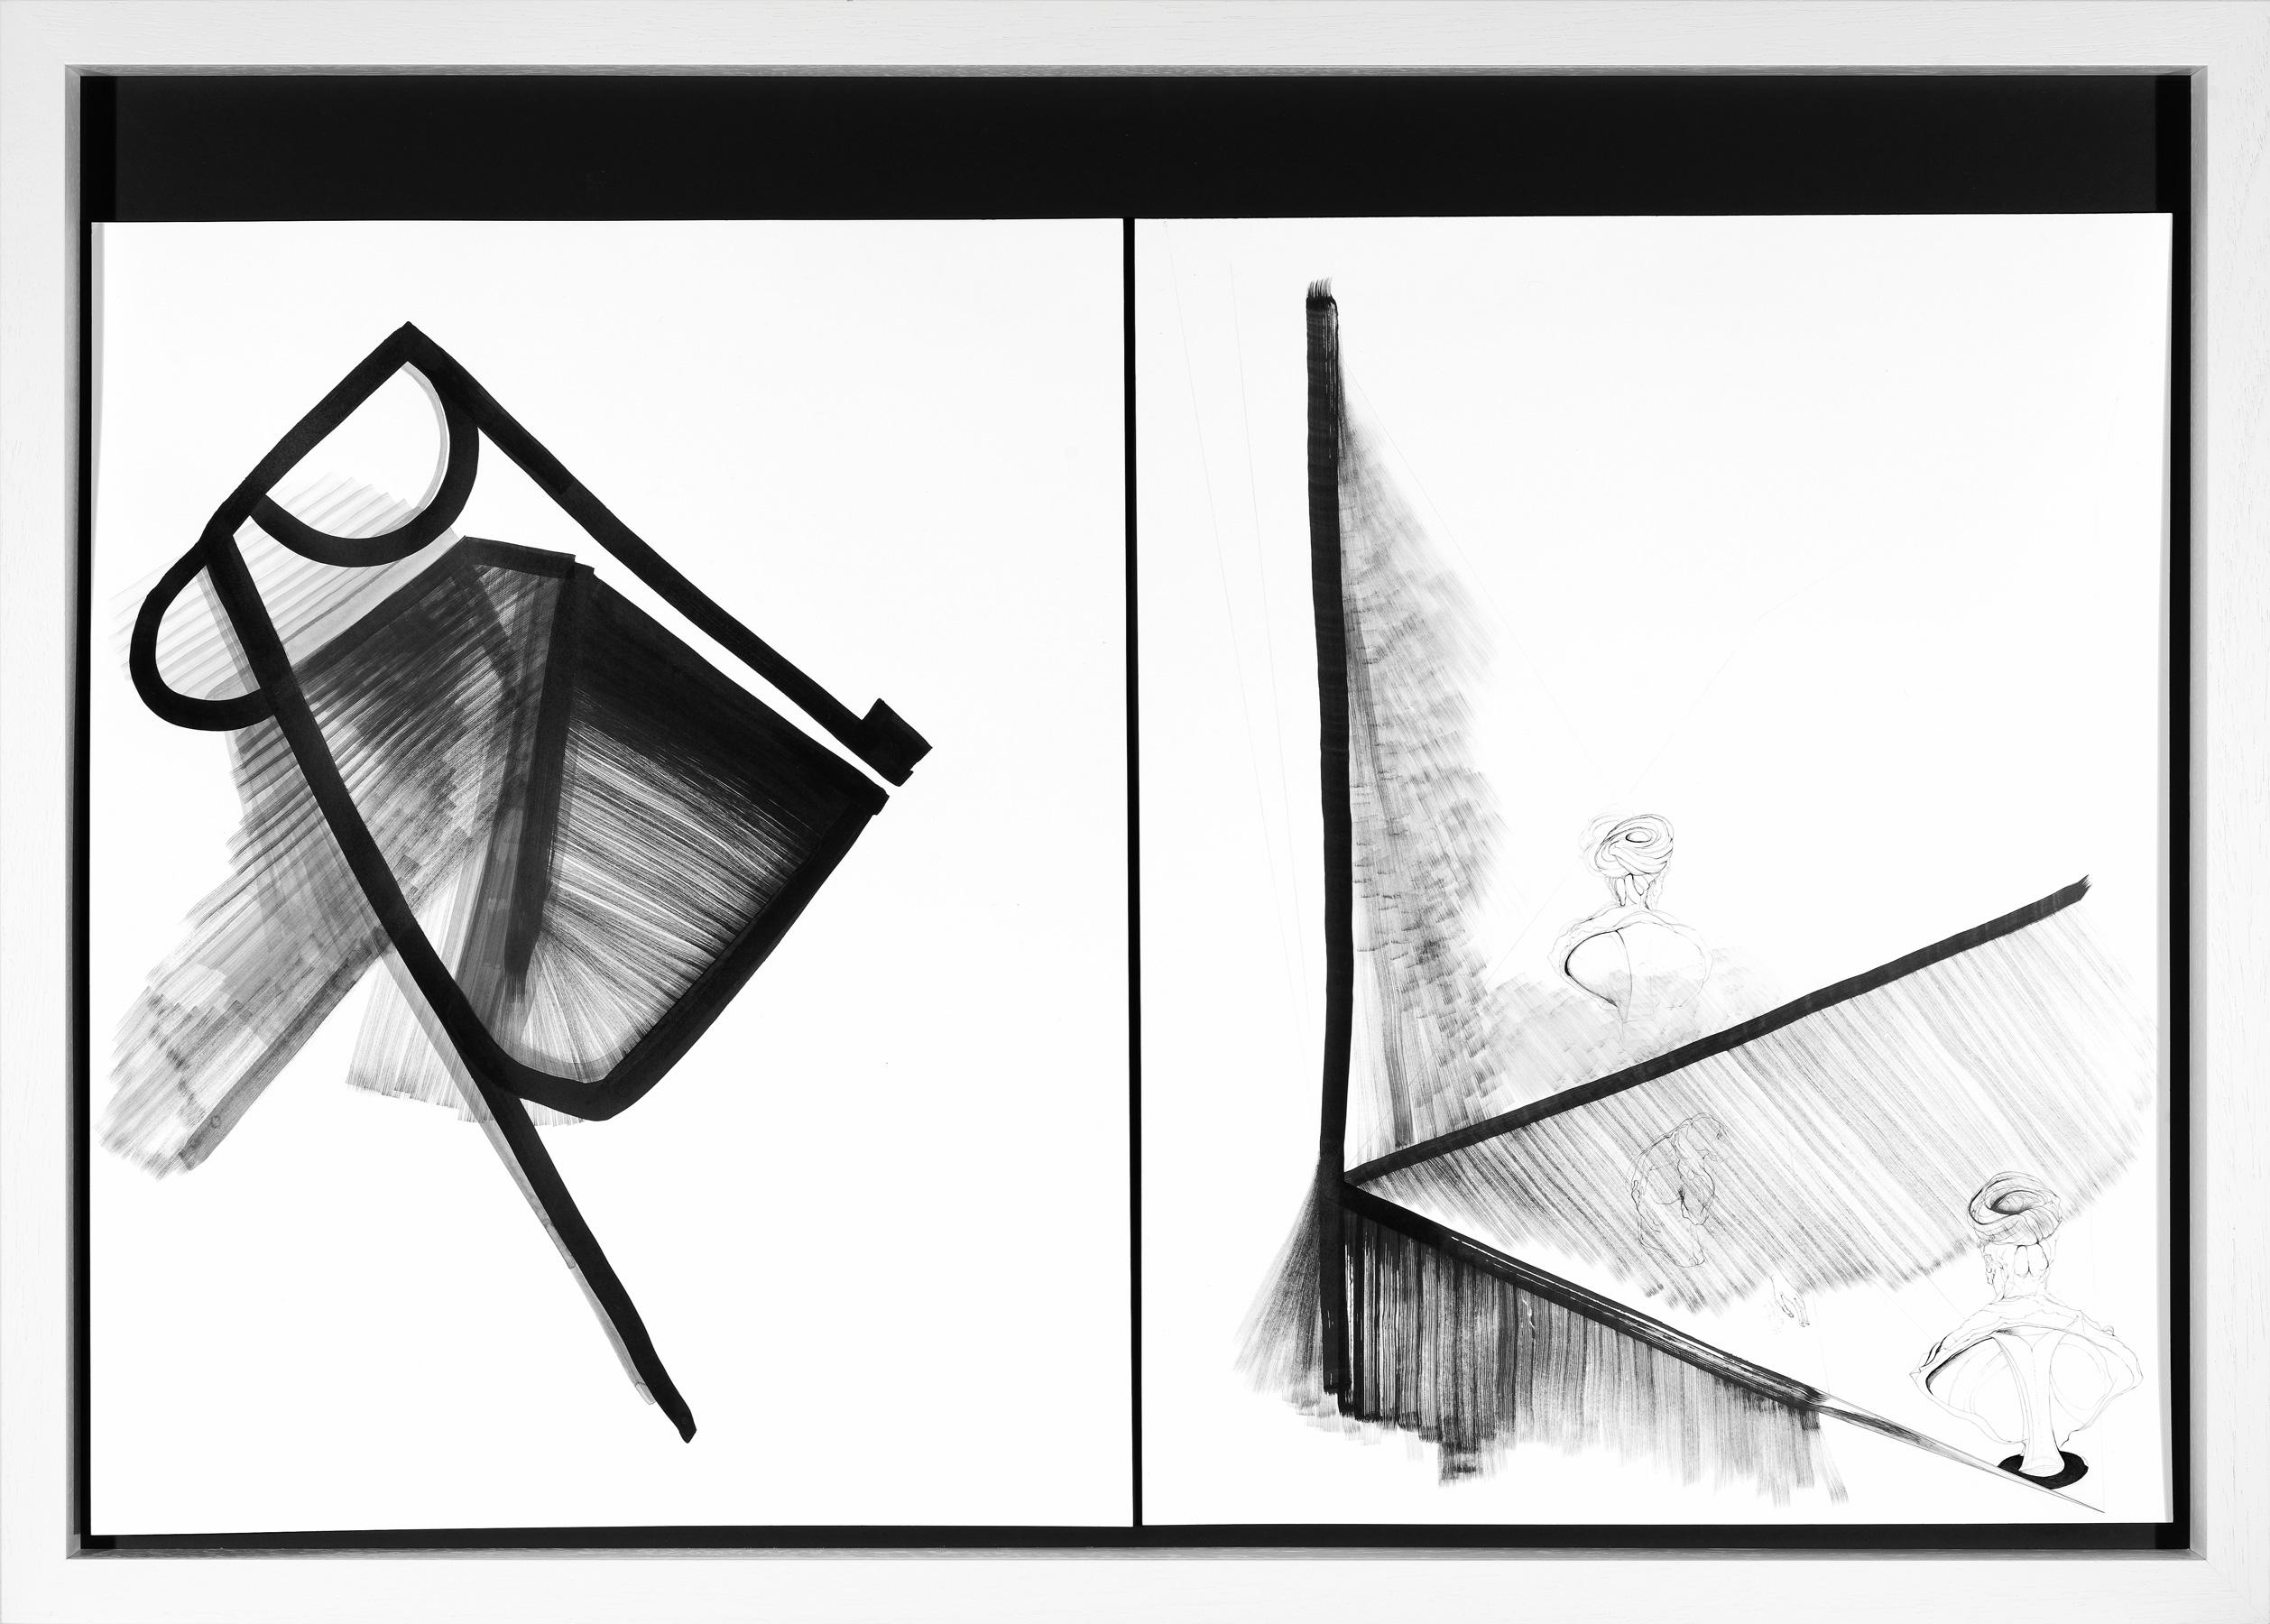 Nina Annabelle Märkl | Balancing the Whimsical 4 | Ink on paper | 75 x 105 x 5 cm | 2015